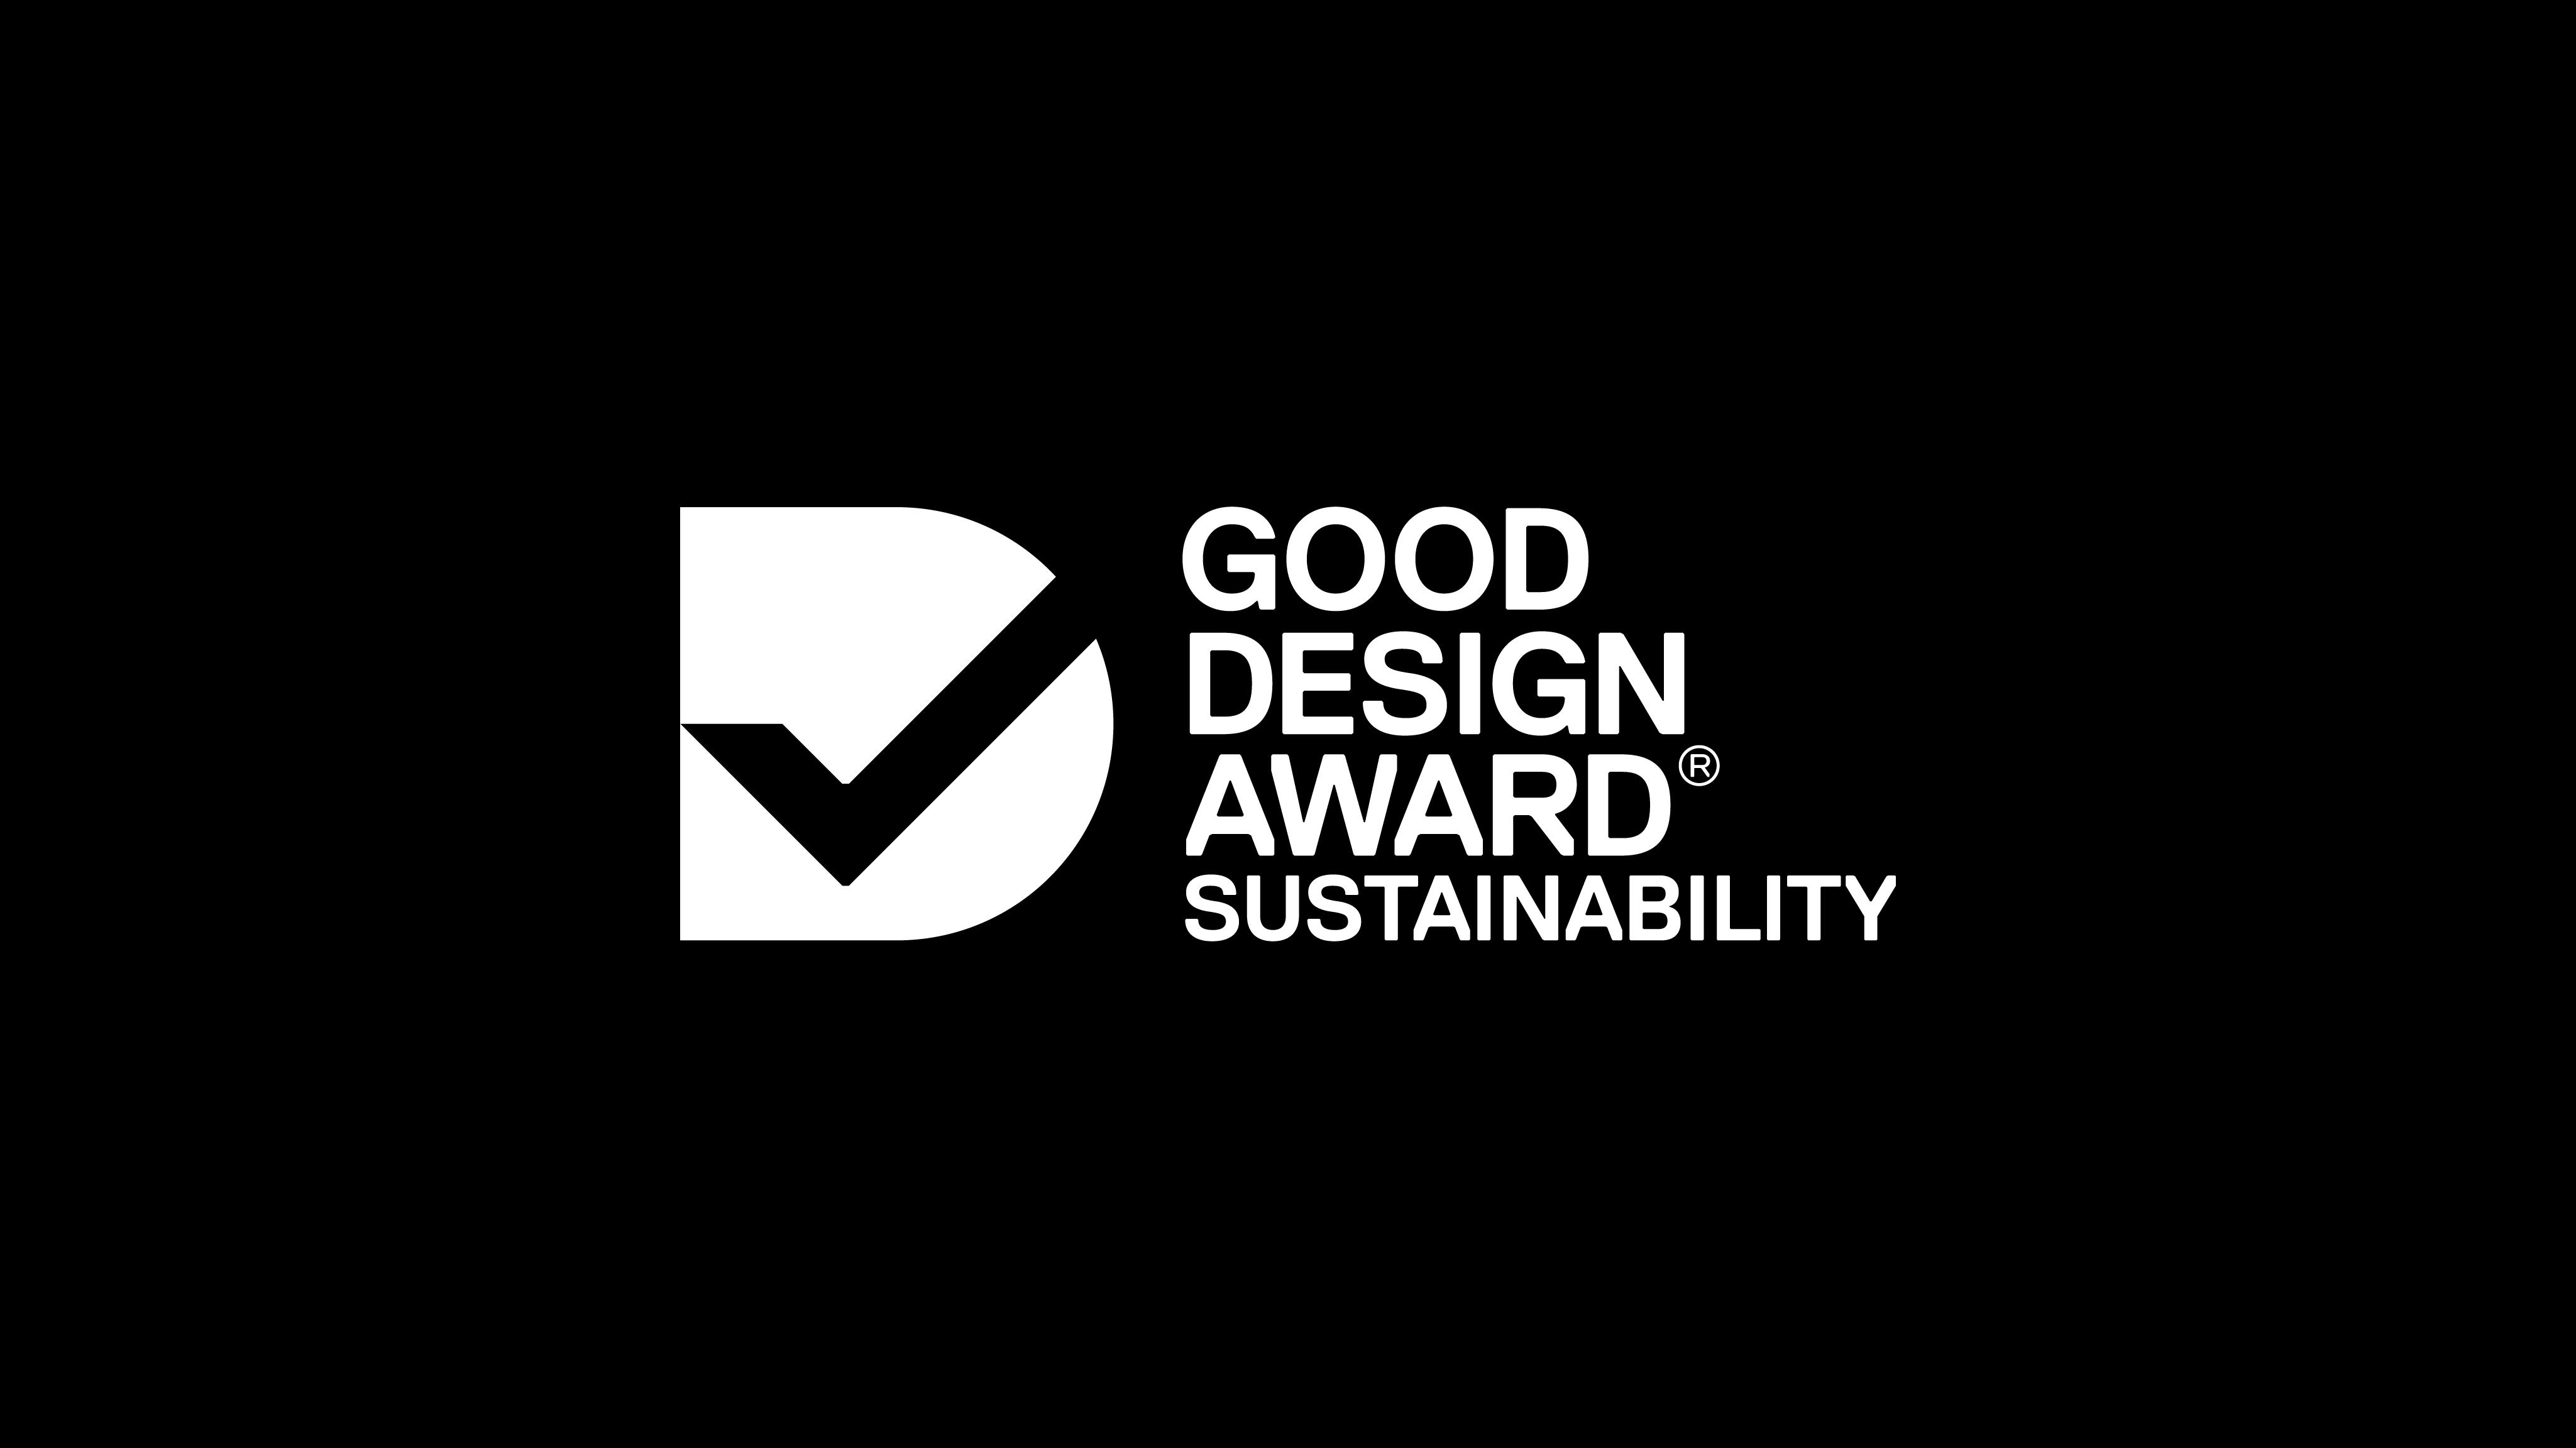 Good Design Award for Sustainability